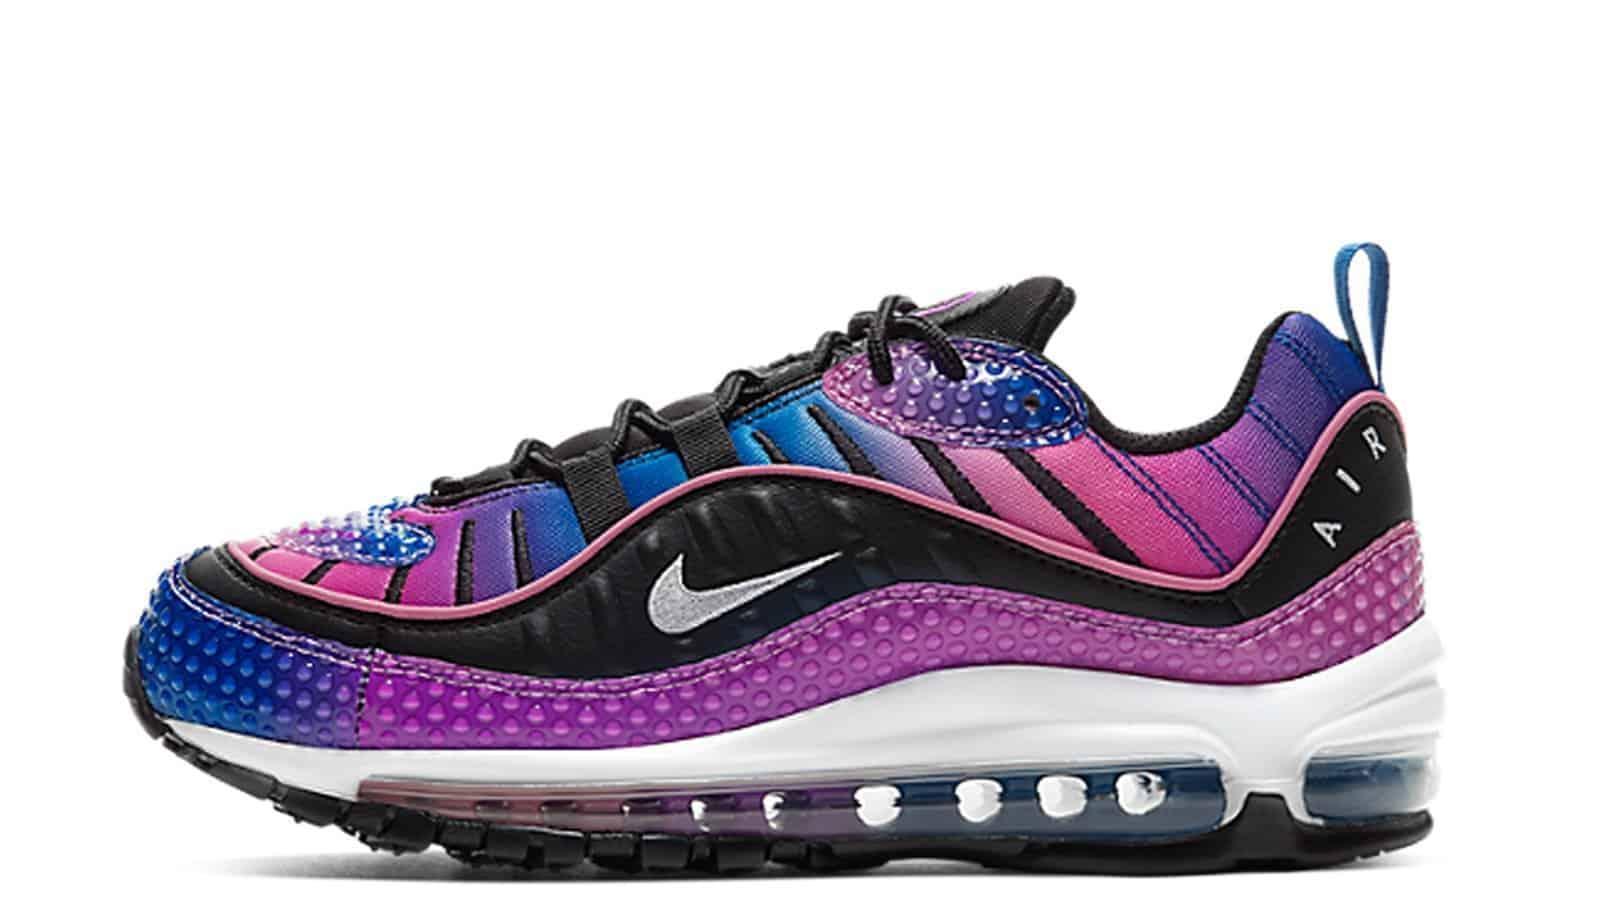 Nike Air Max 98 Bubbles Purple